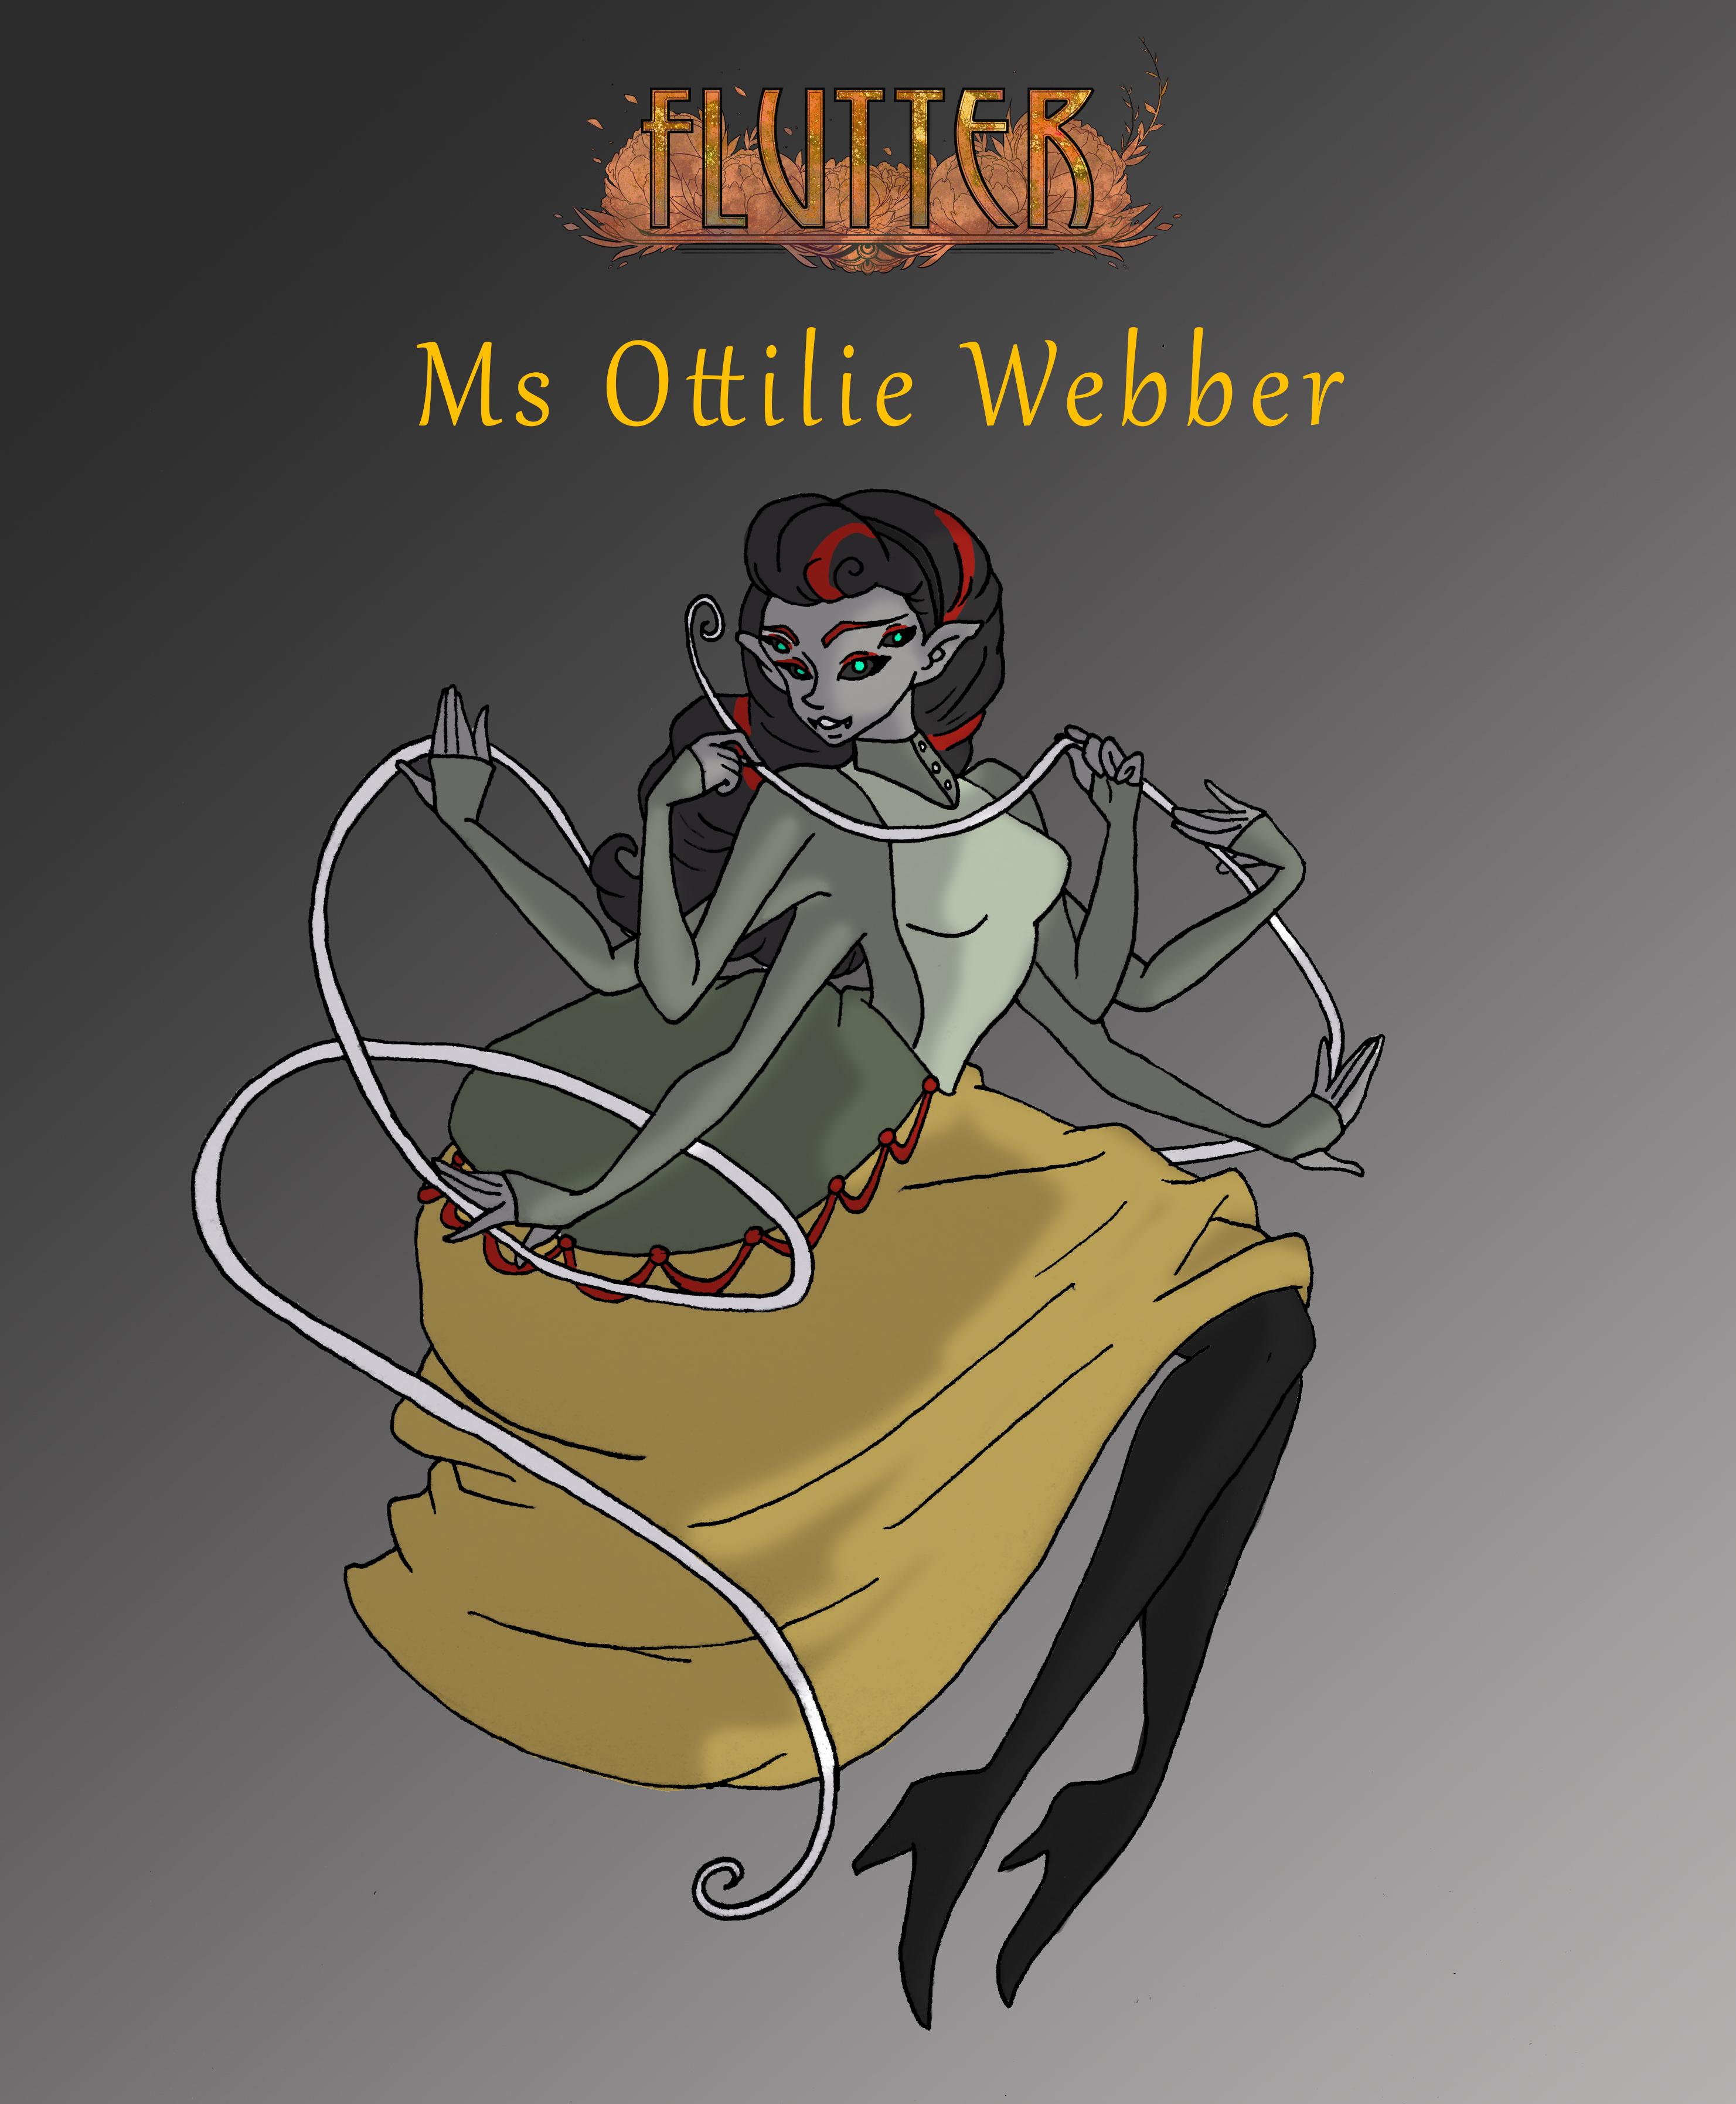 Ms Ottilie Webber